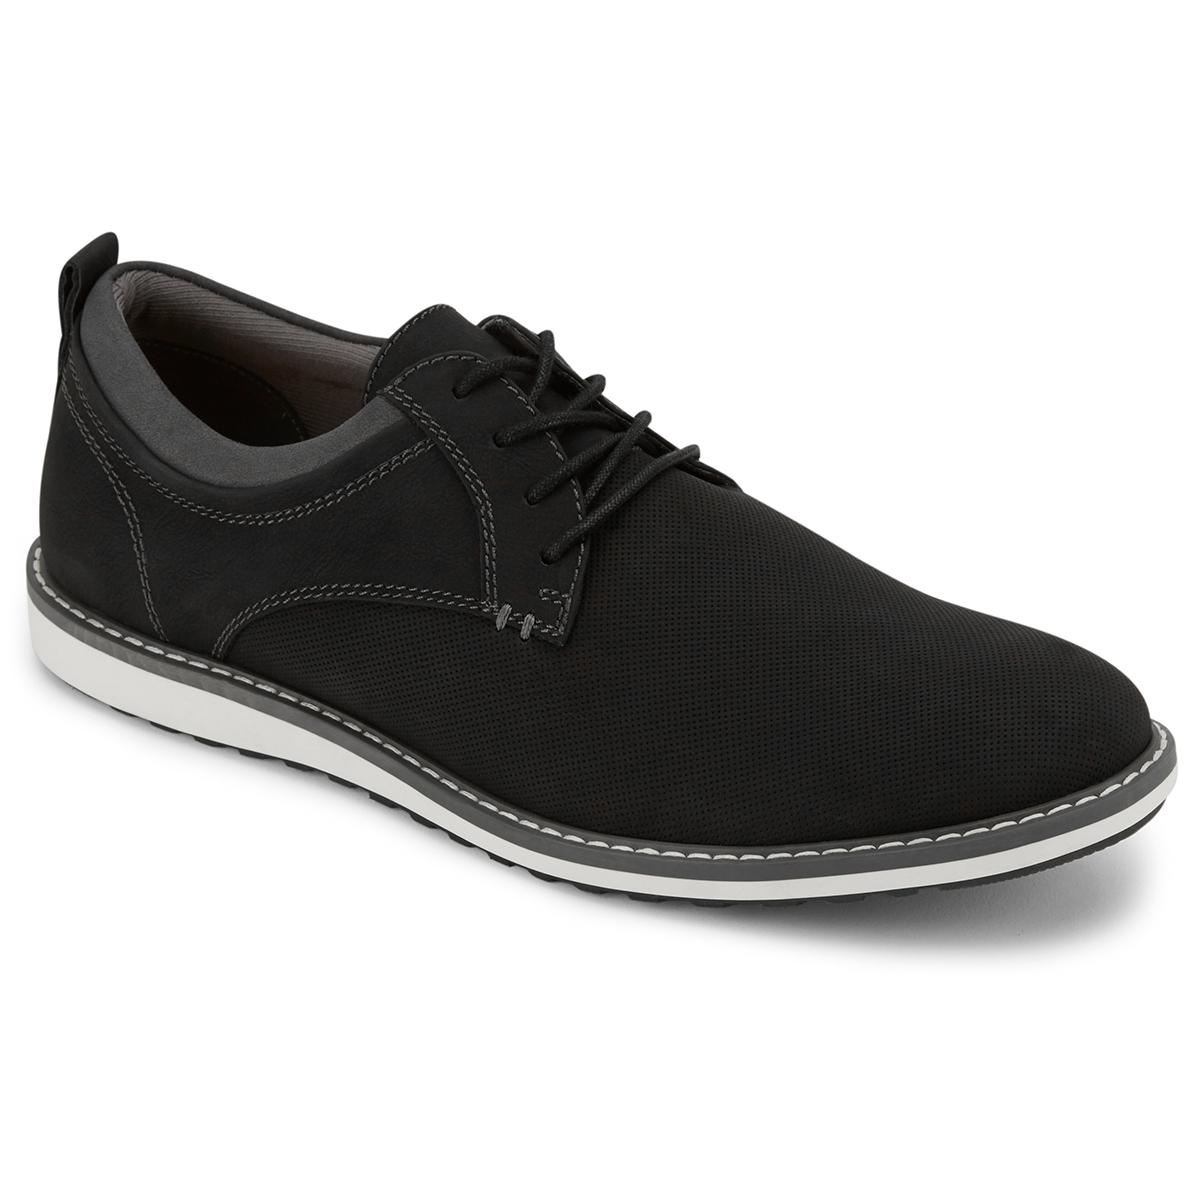 Dockers Men's Braxton Oxford Shoe - Black, 9